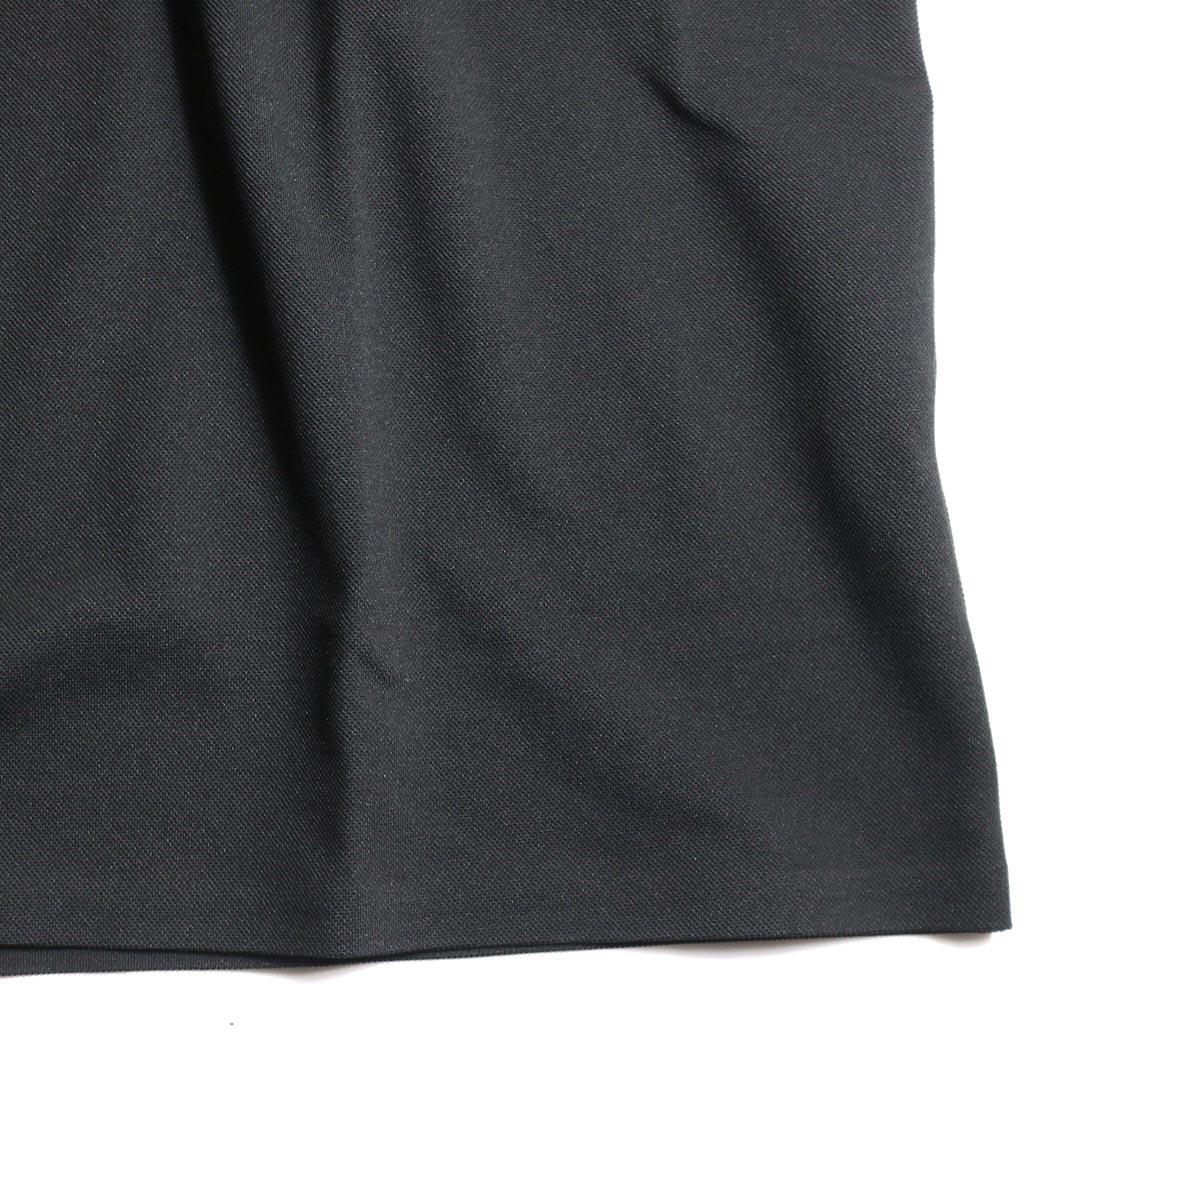 DESCENTE PAUSE / POLO SHIRT (Black)裾